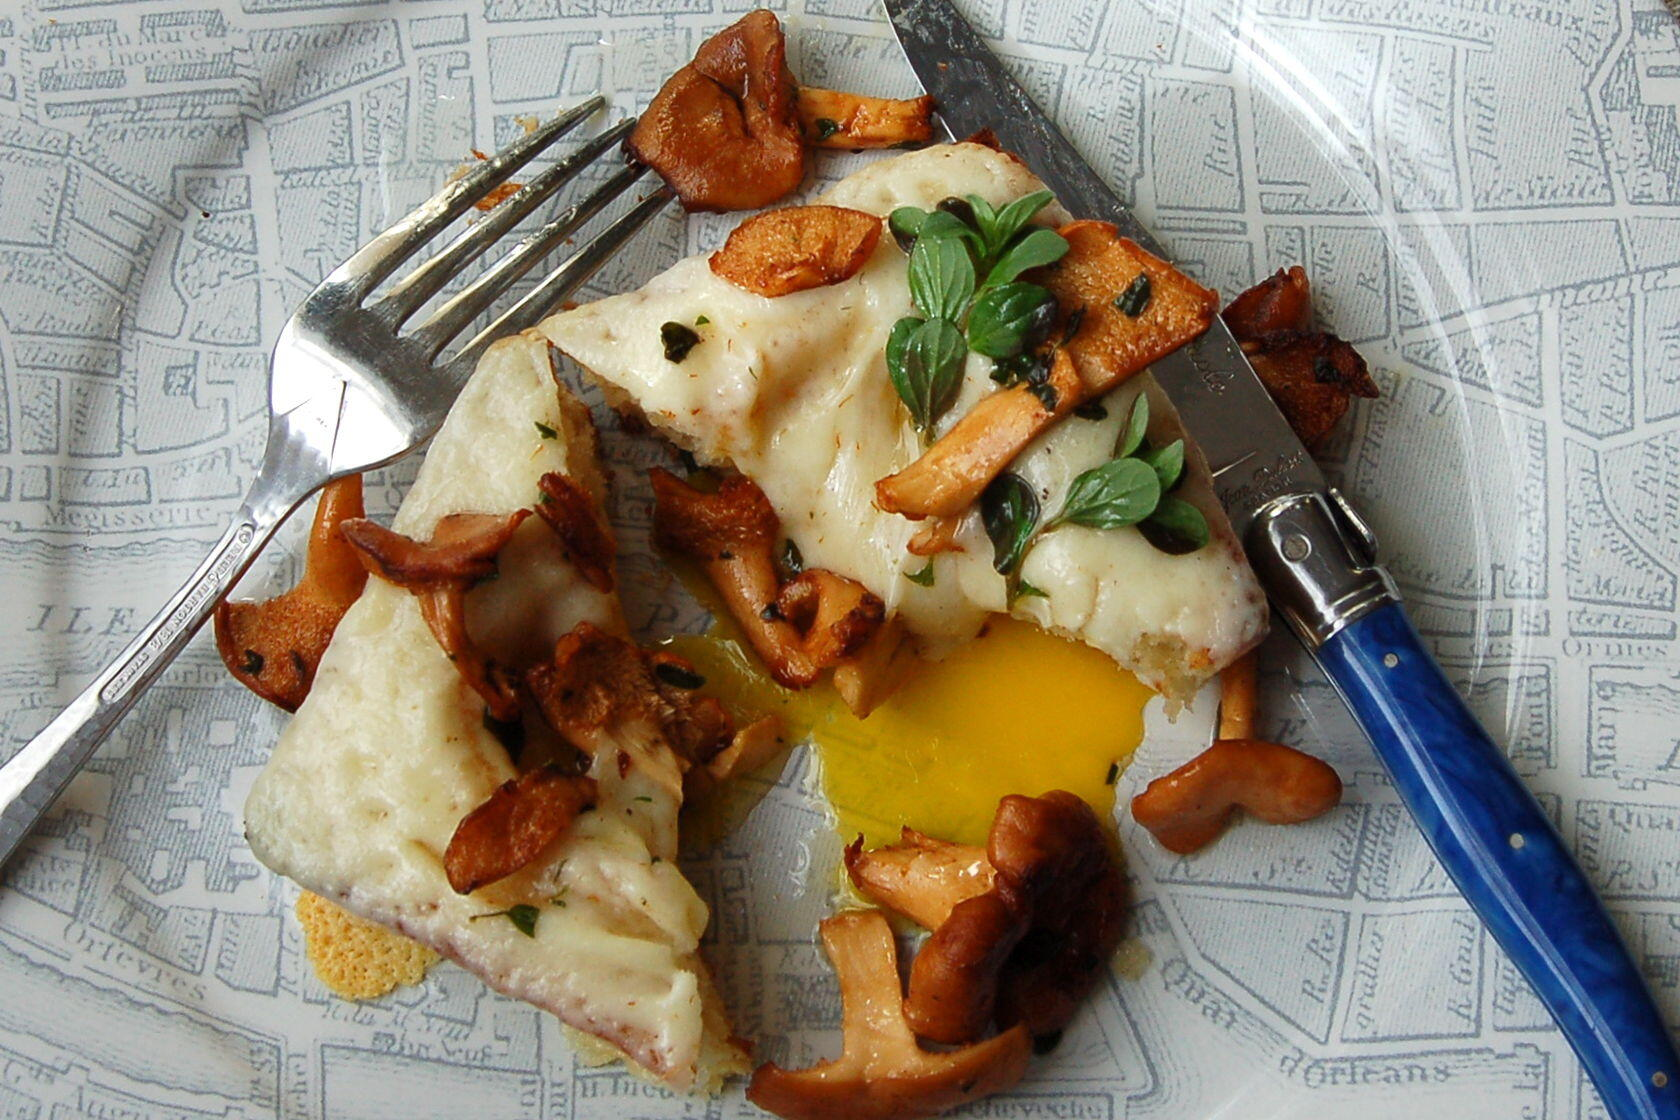 Bistro Sandwich Chanterelle Mushrooms toasted bread box Chanterelle Mushrooms @CocoaandLavender